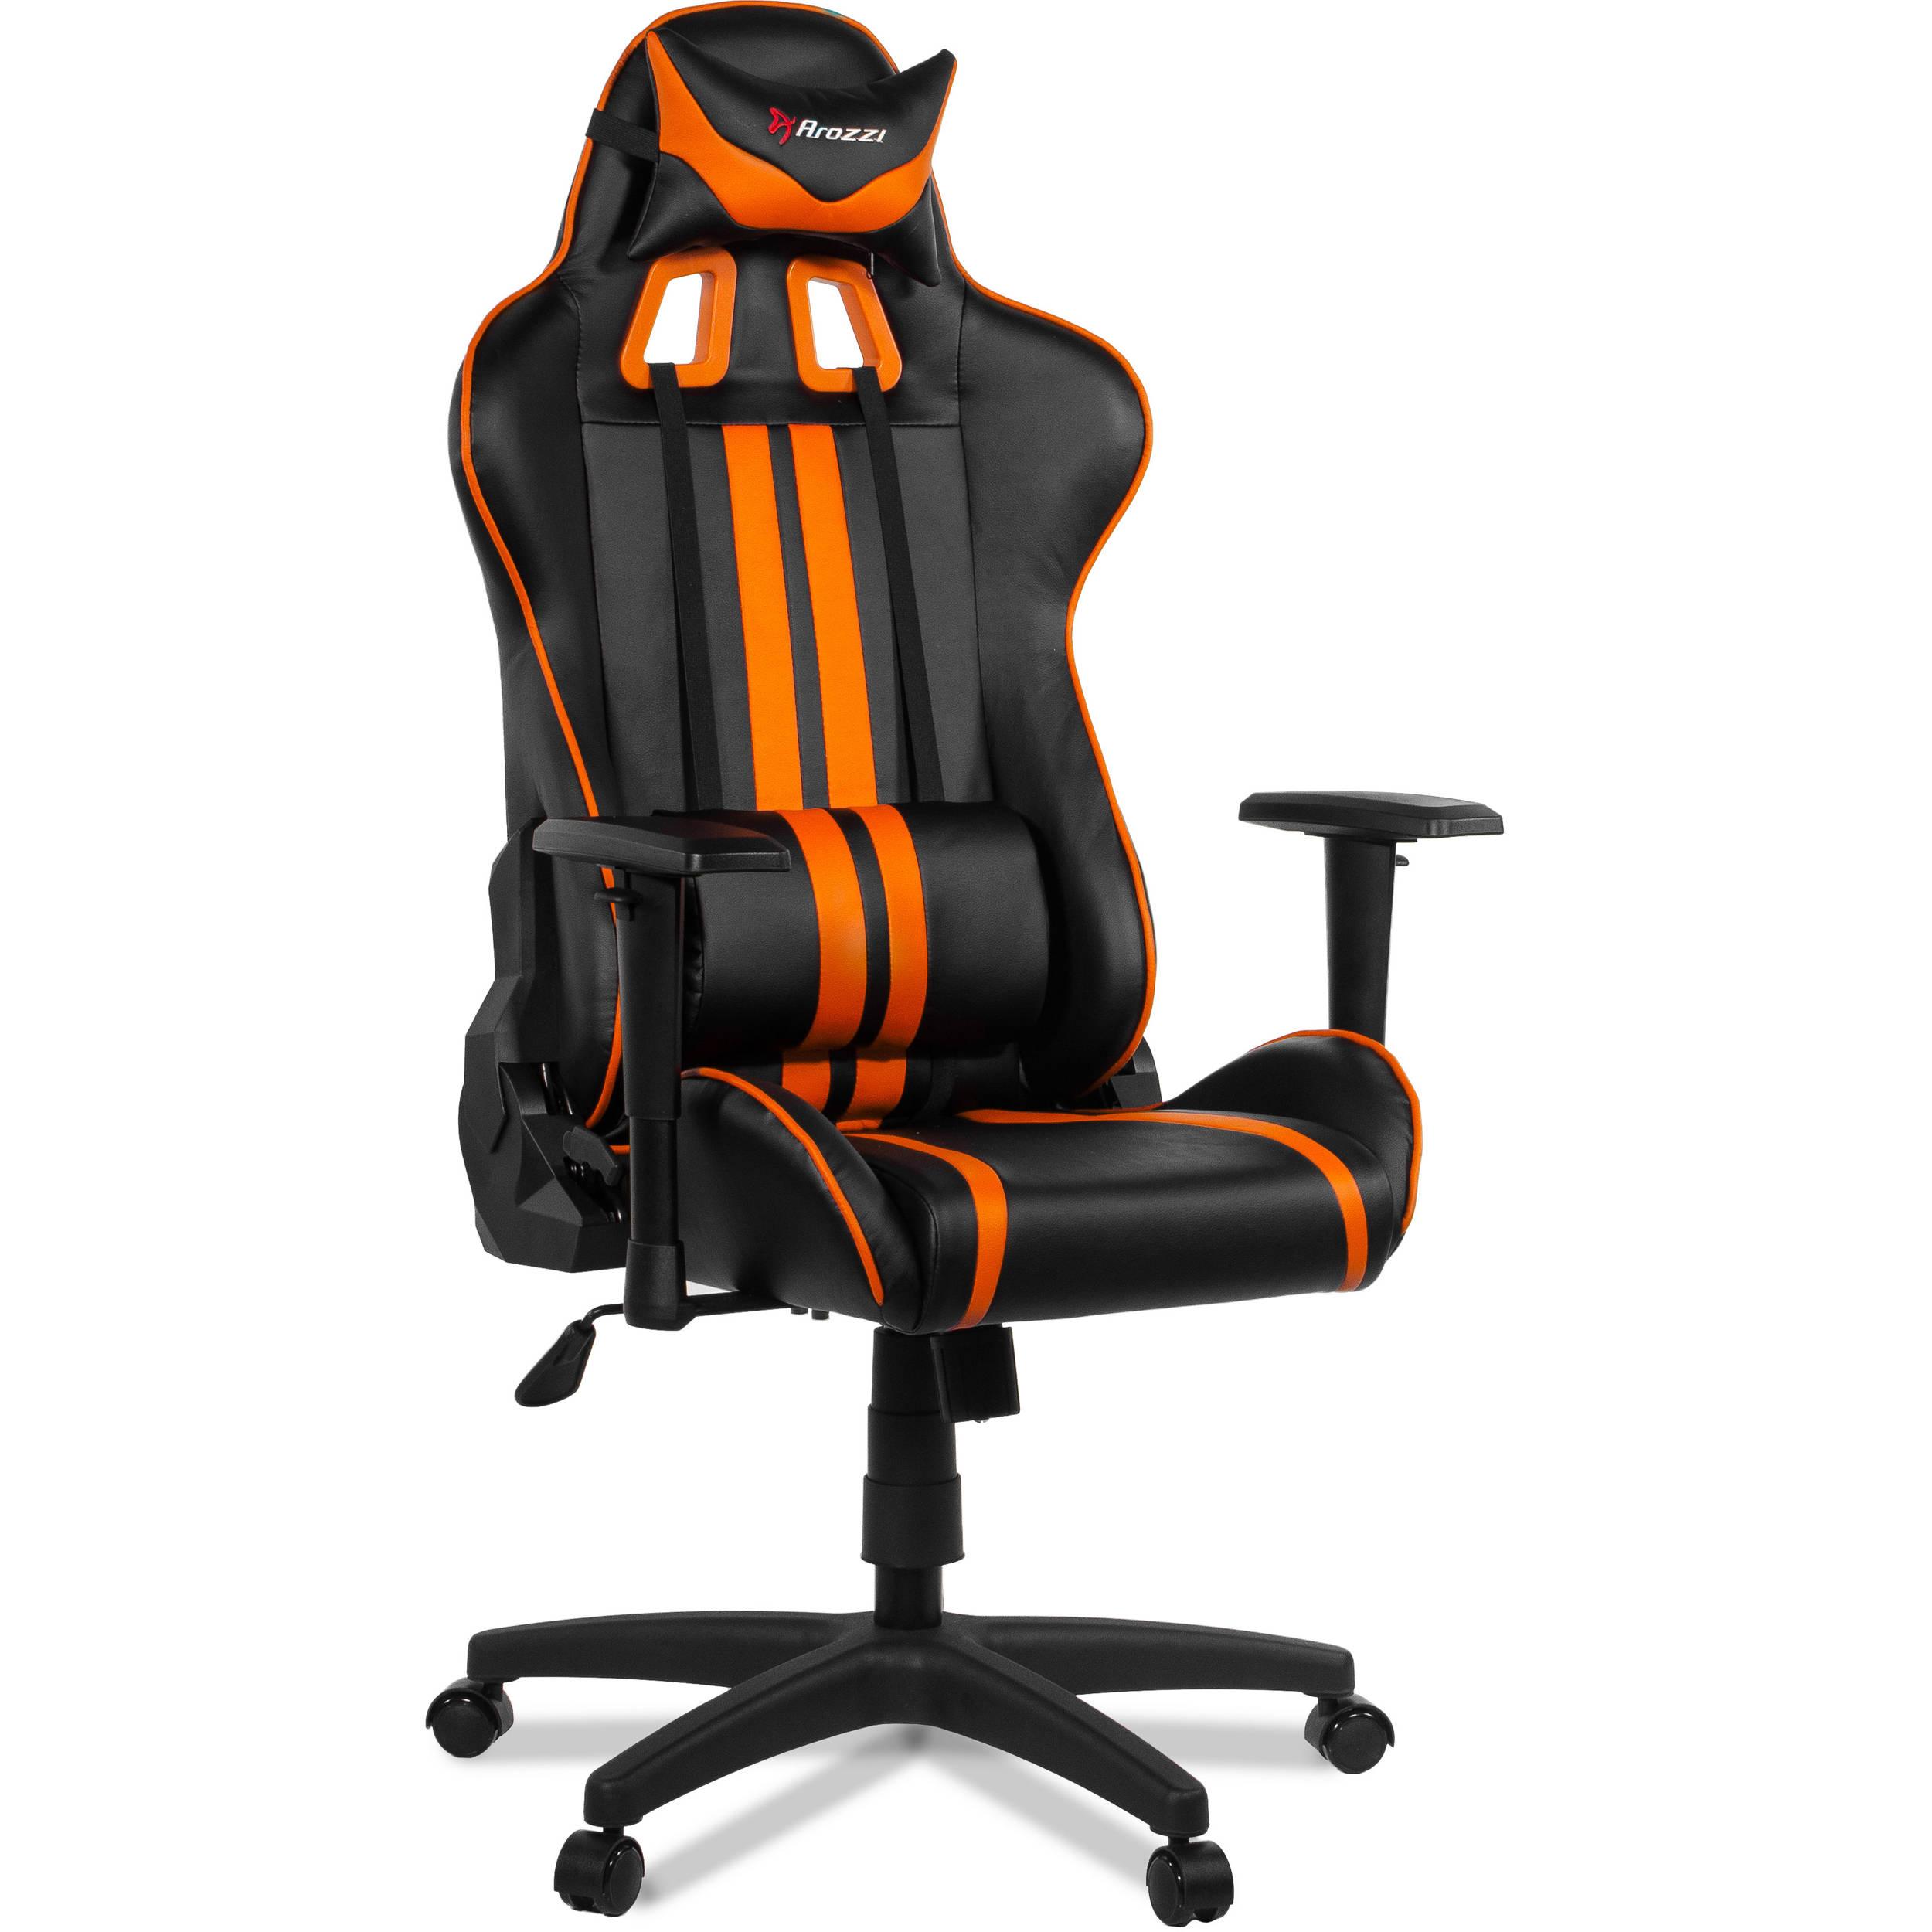 Arozzi Mezzo Gaming Chair Orange MEZZO OR B&H Video